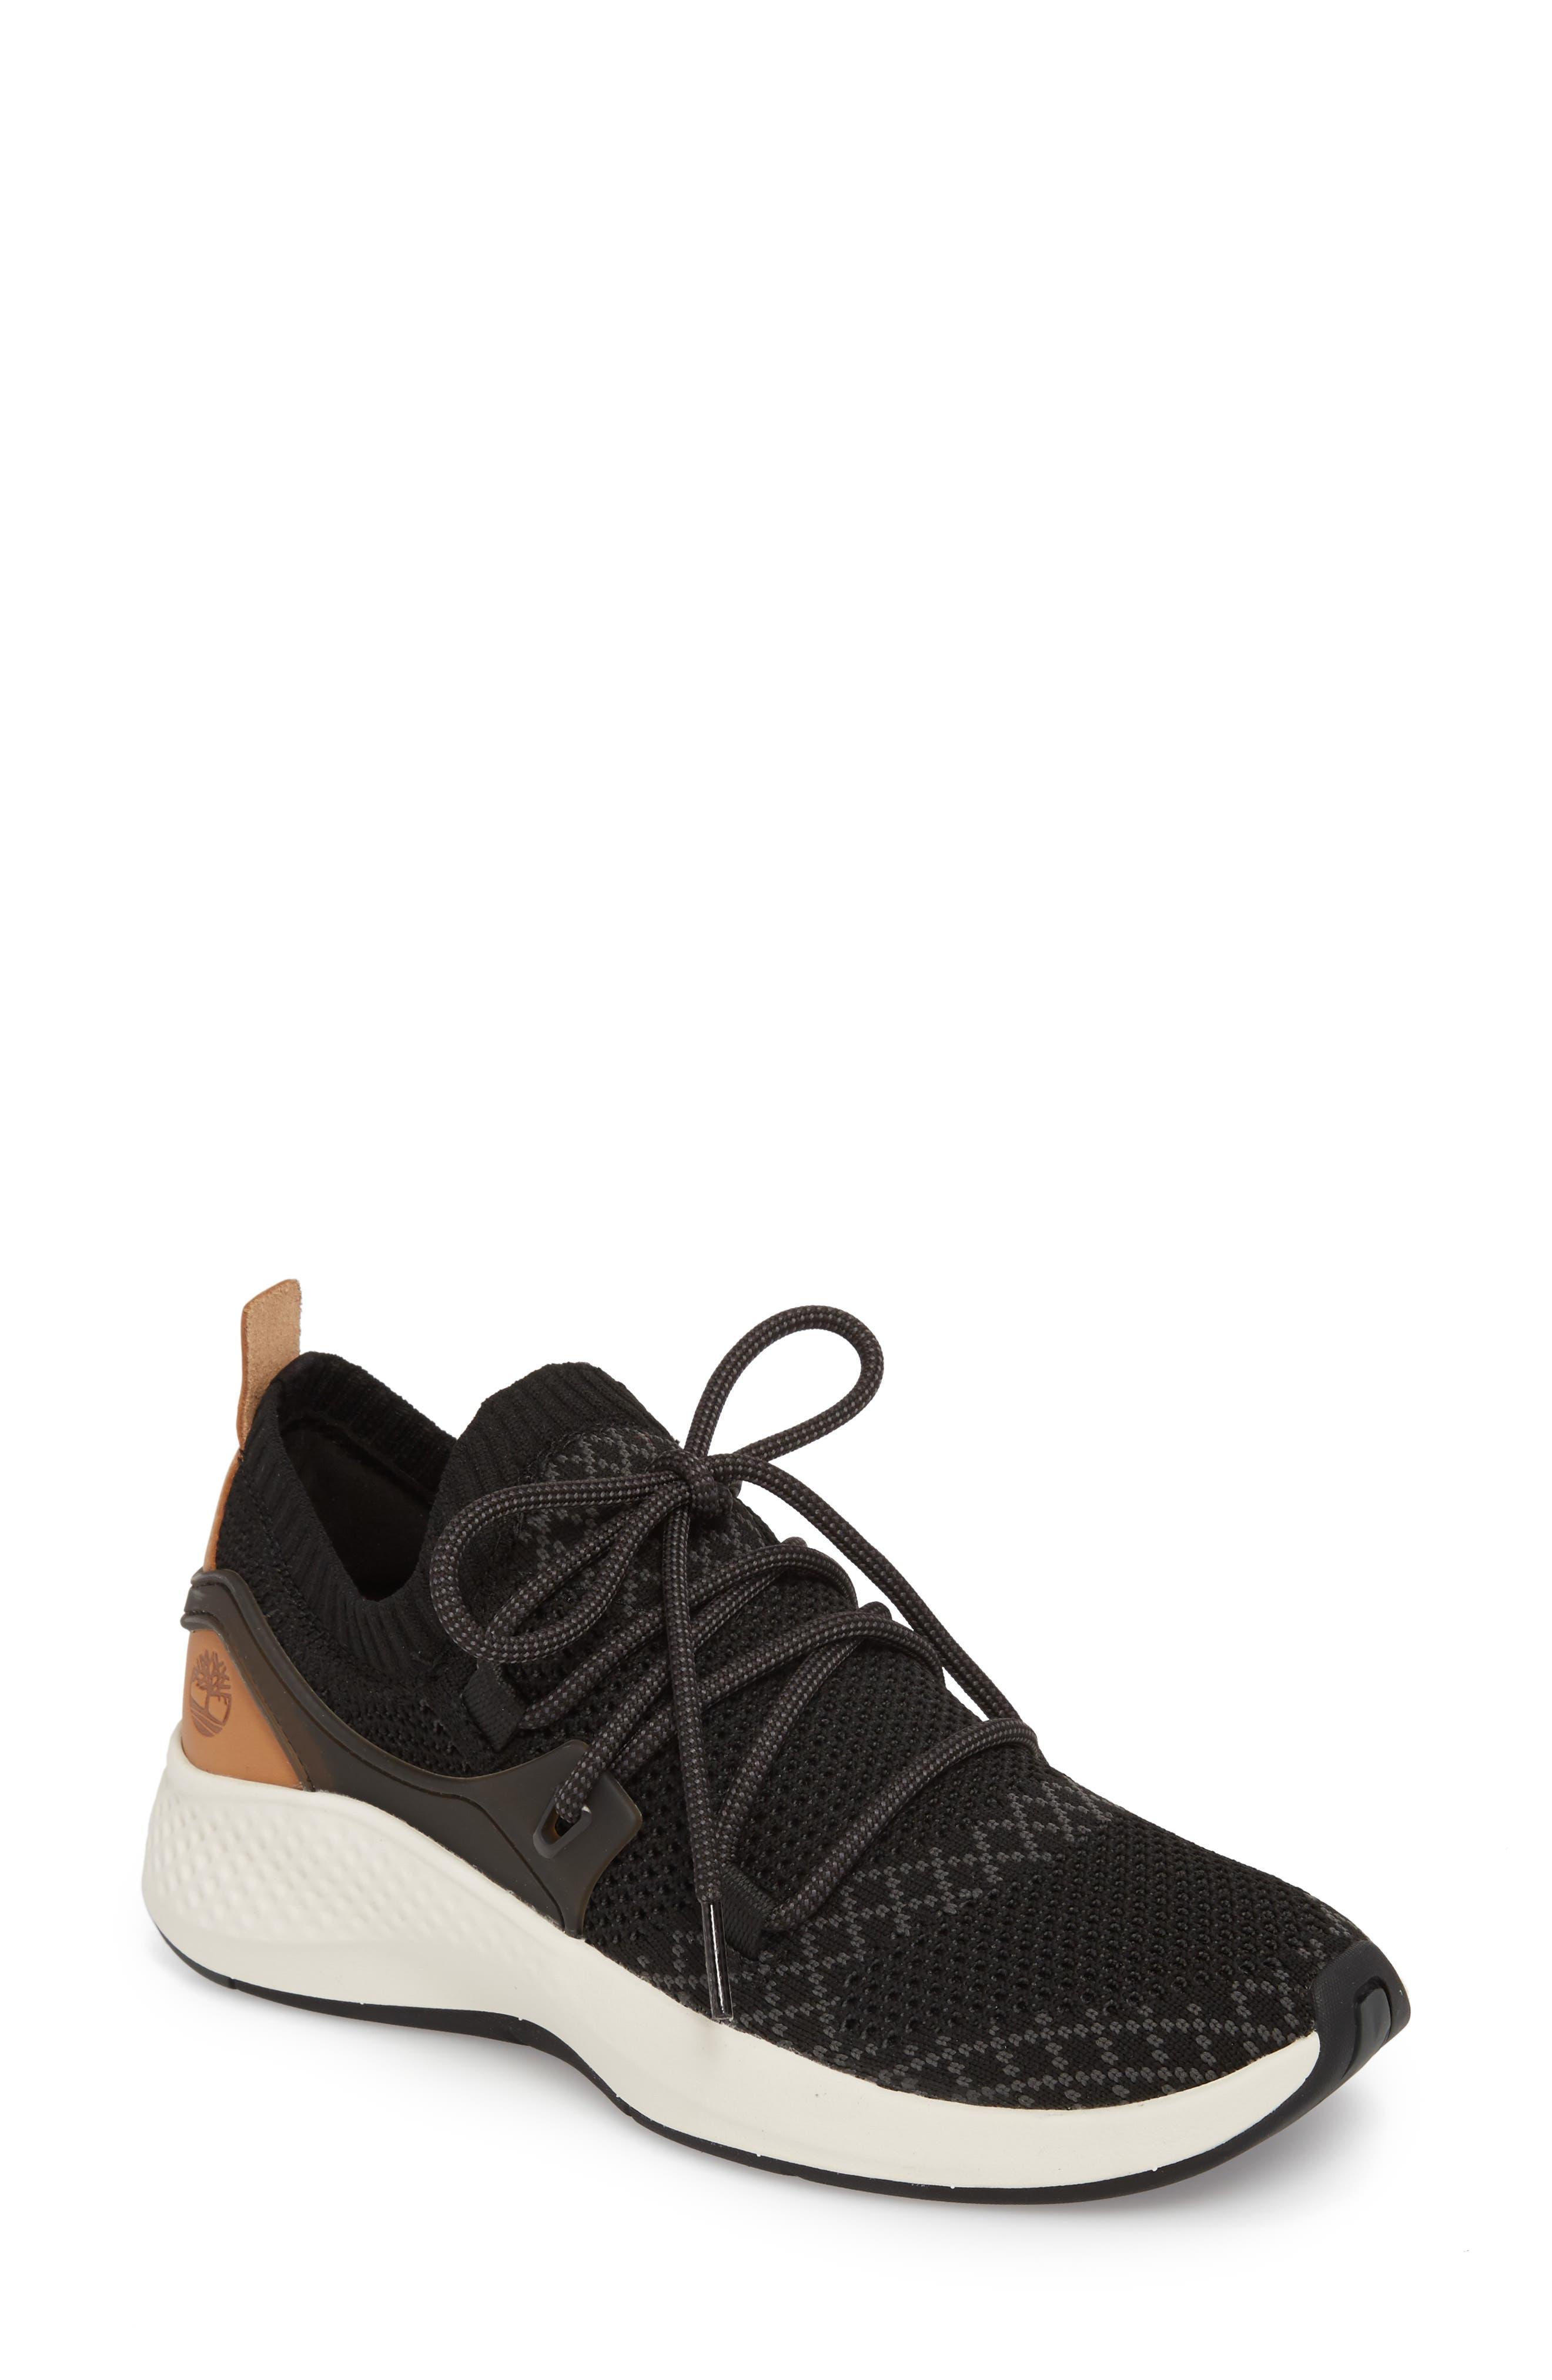 TIMBERLAND FlyRoam Go Knit Sneaker, Main, color, 001